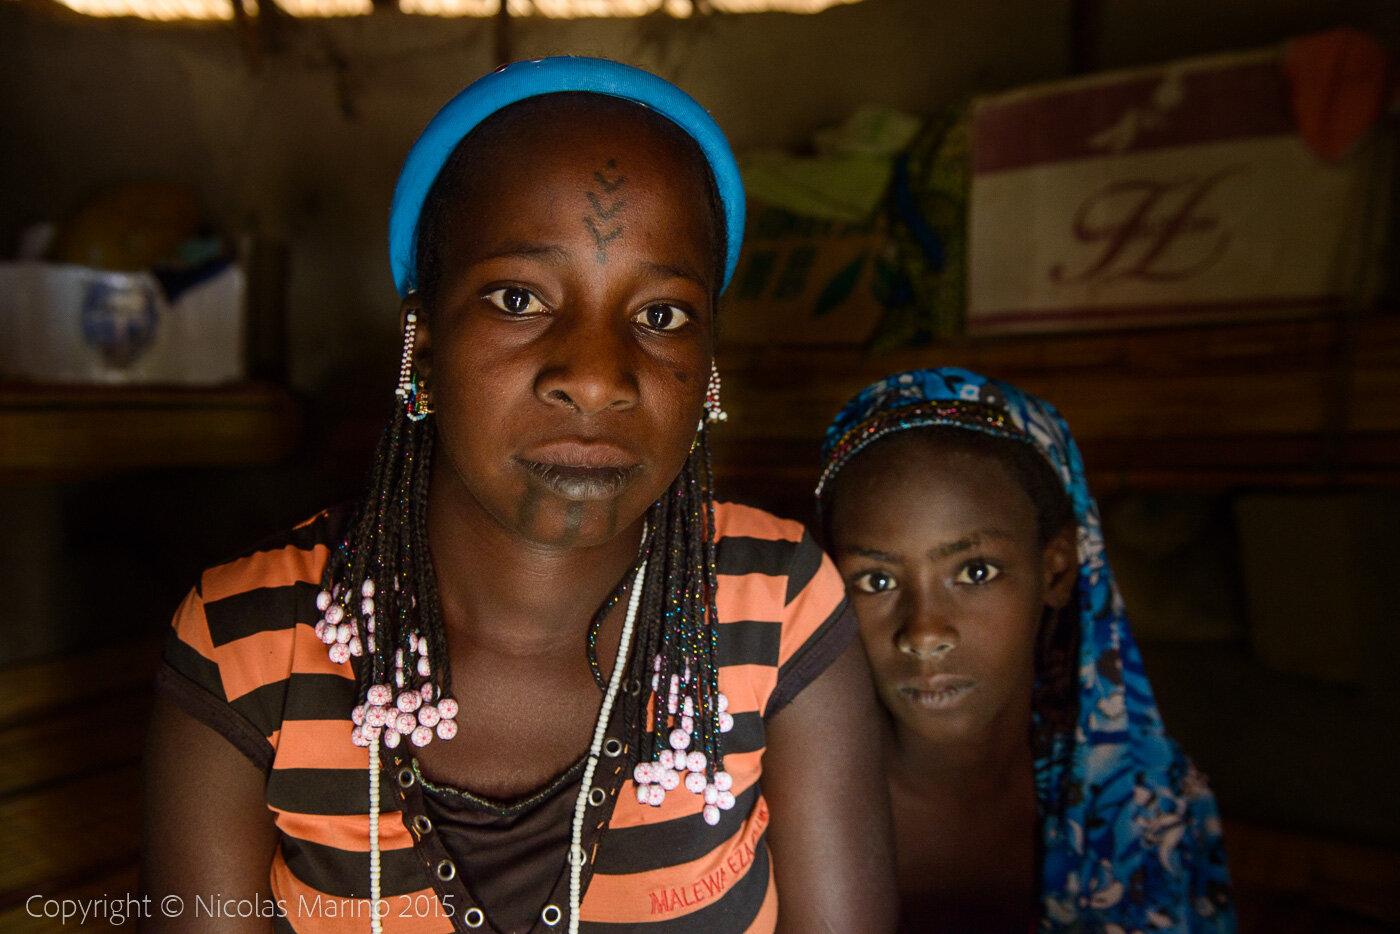 Rural life in a Fulani village of the Sahel in northeastern Burkina Faso